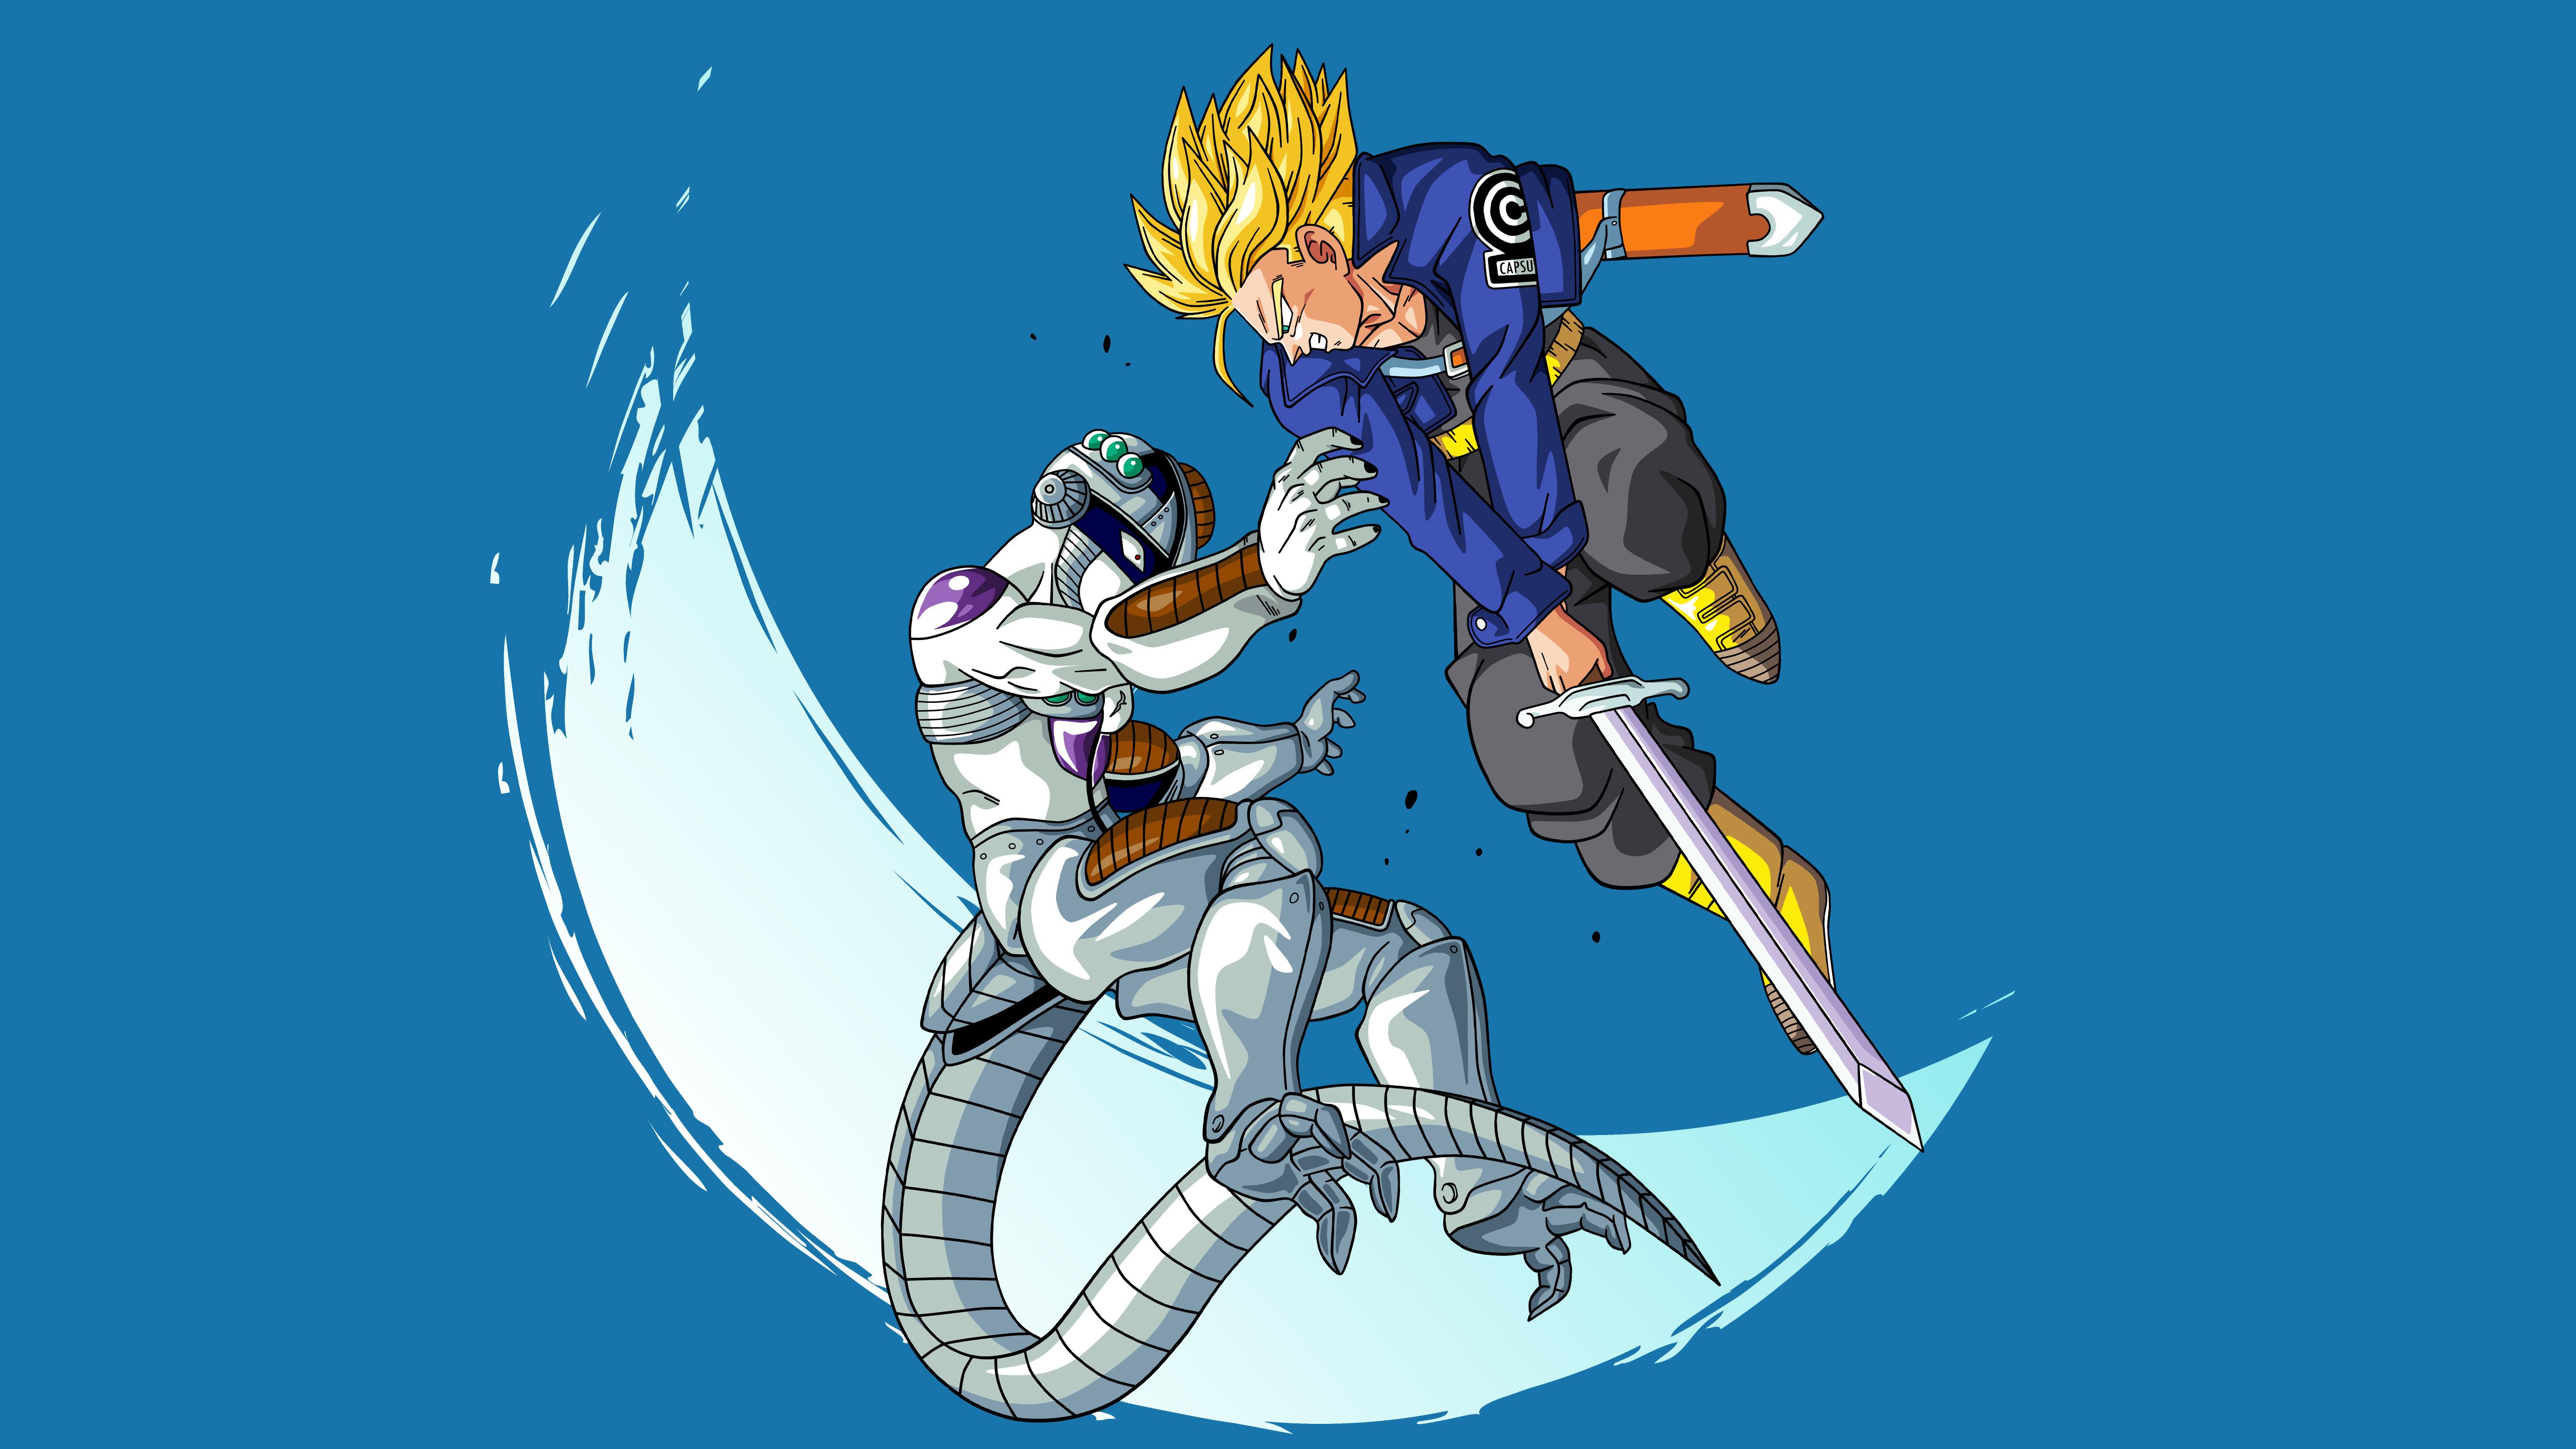 750x1334 Freeza vs Trunks Dragon Ball